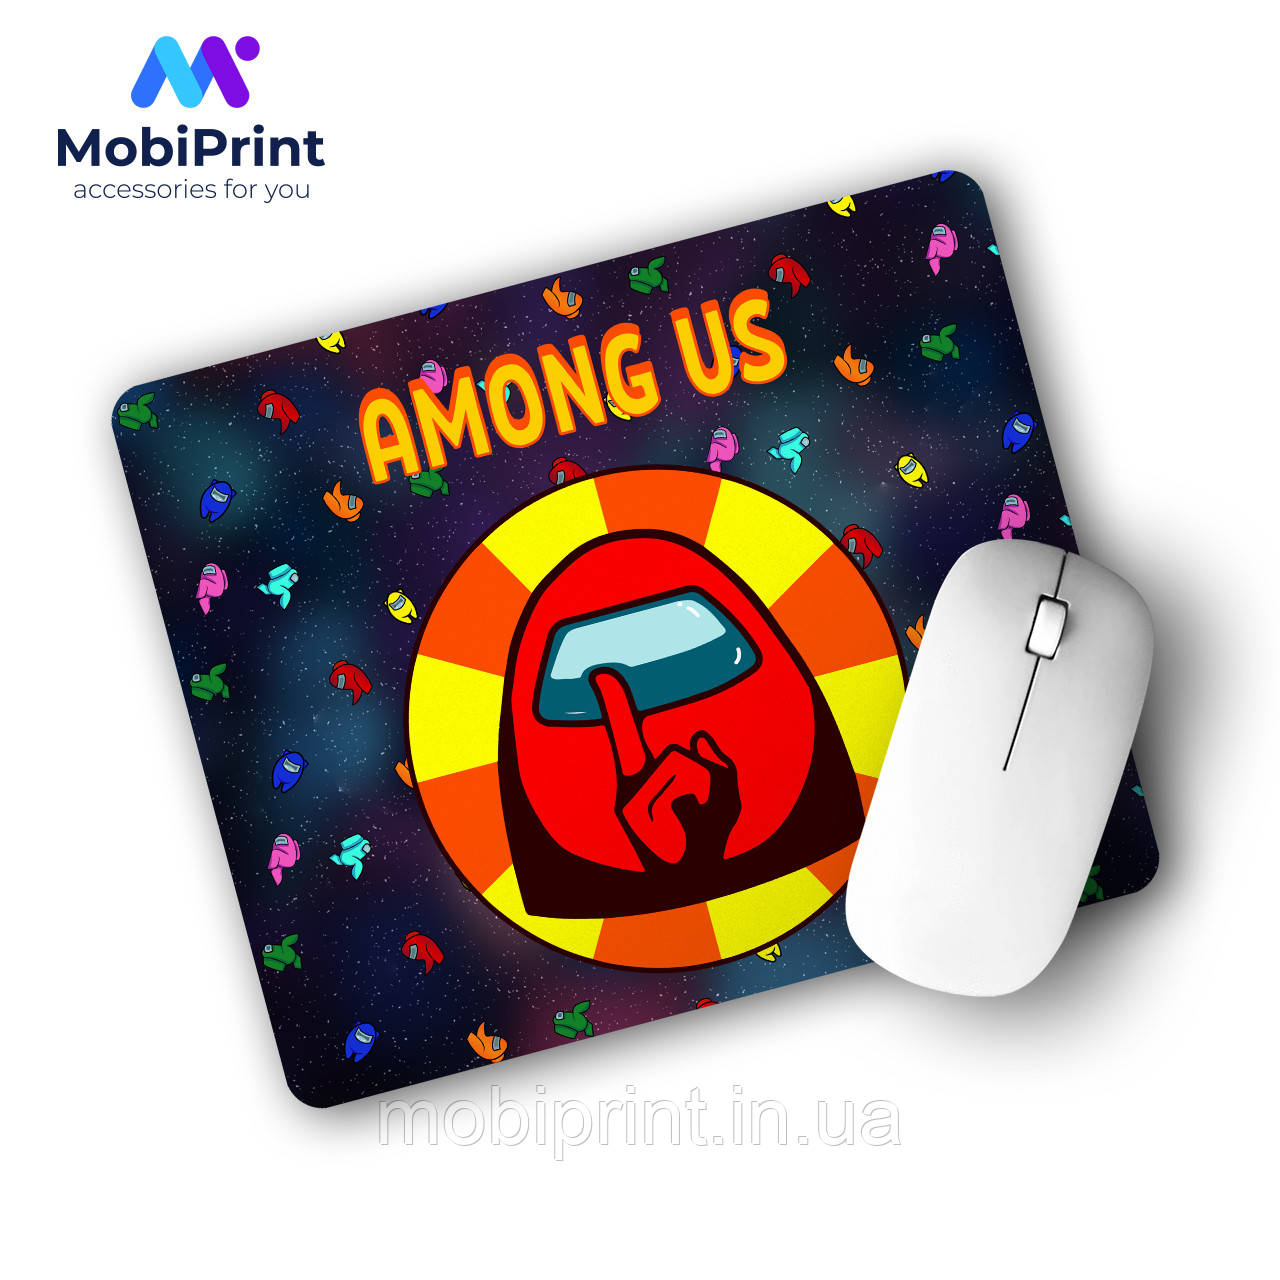 Коврик для мышки Амонг Ас Красный (Among Us Red) (25108-2412)